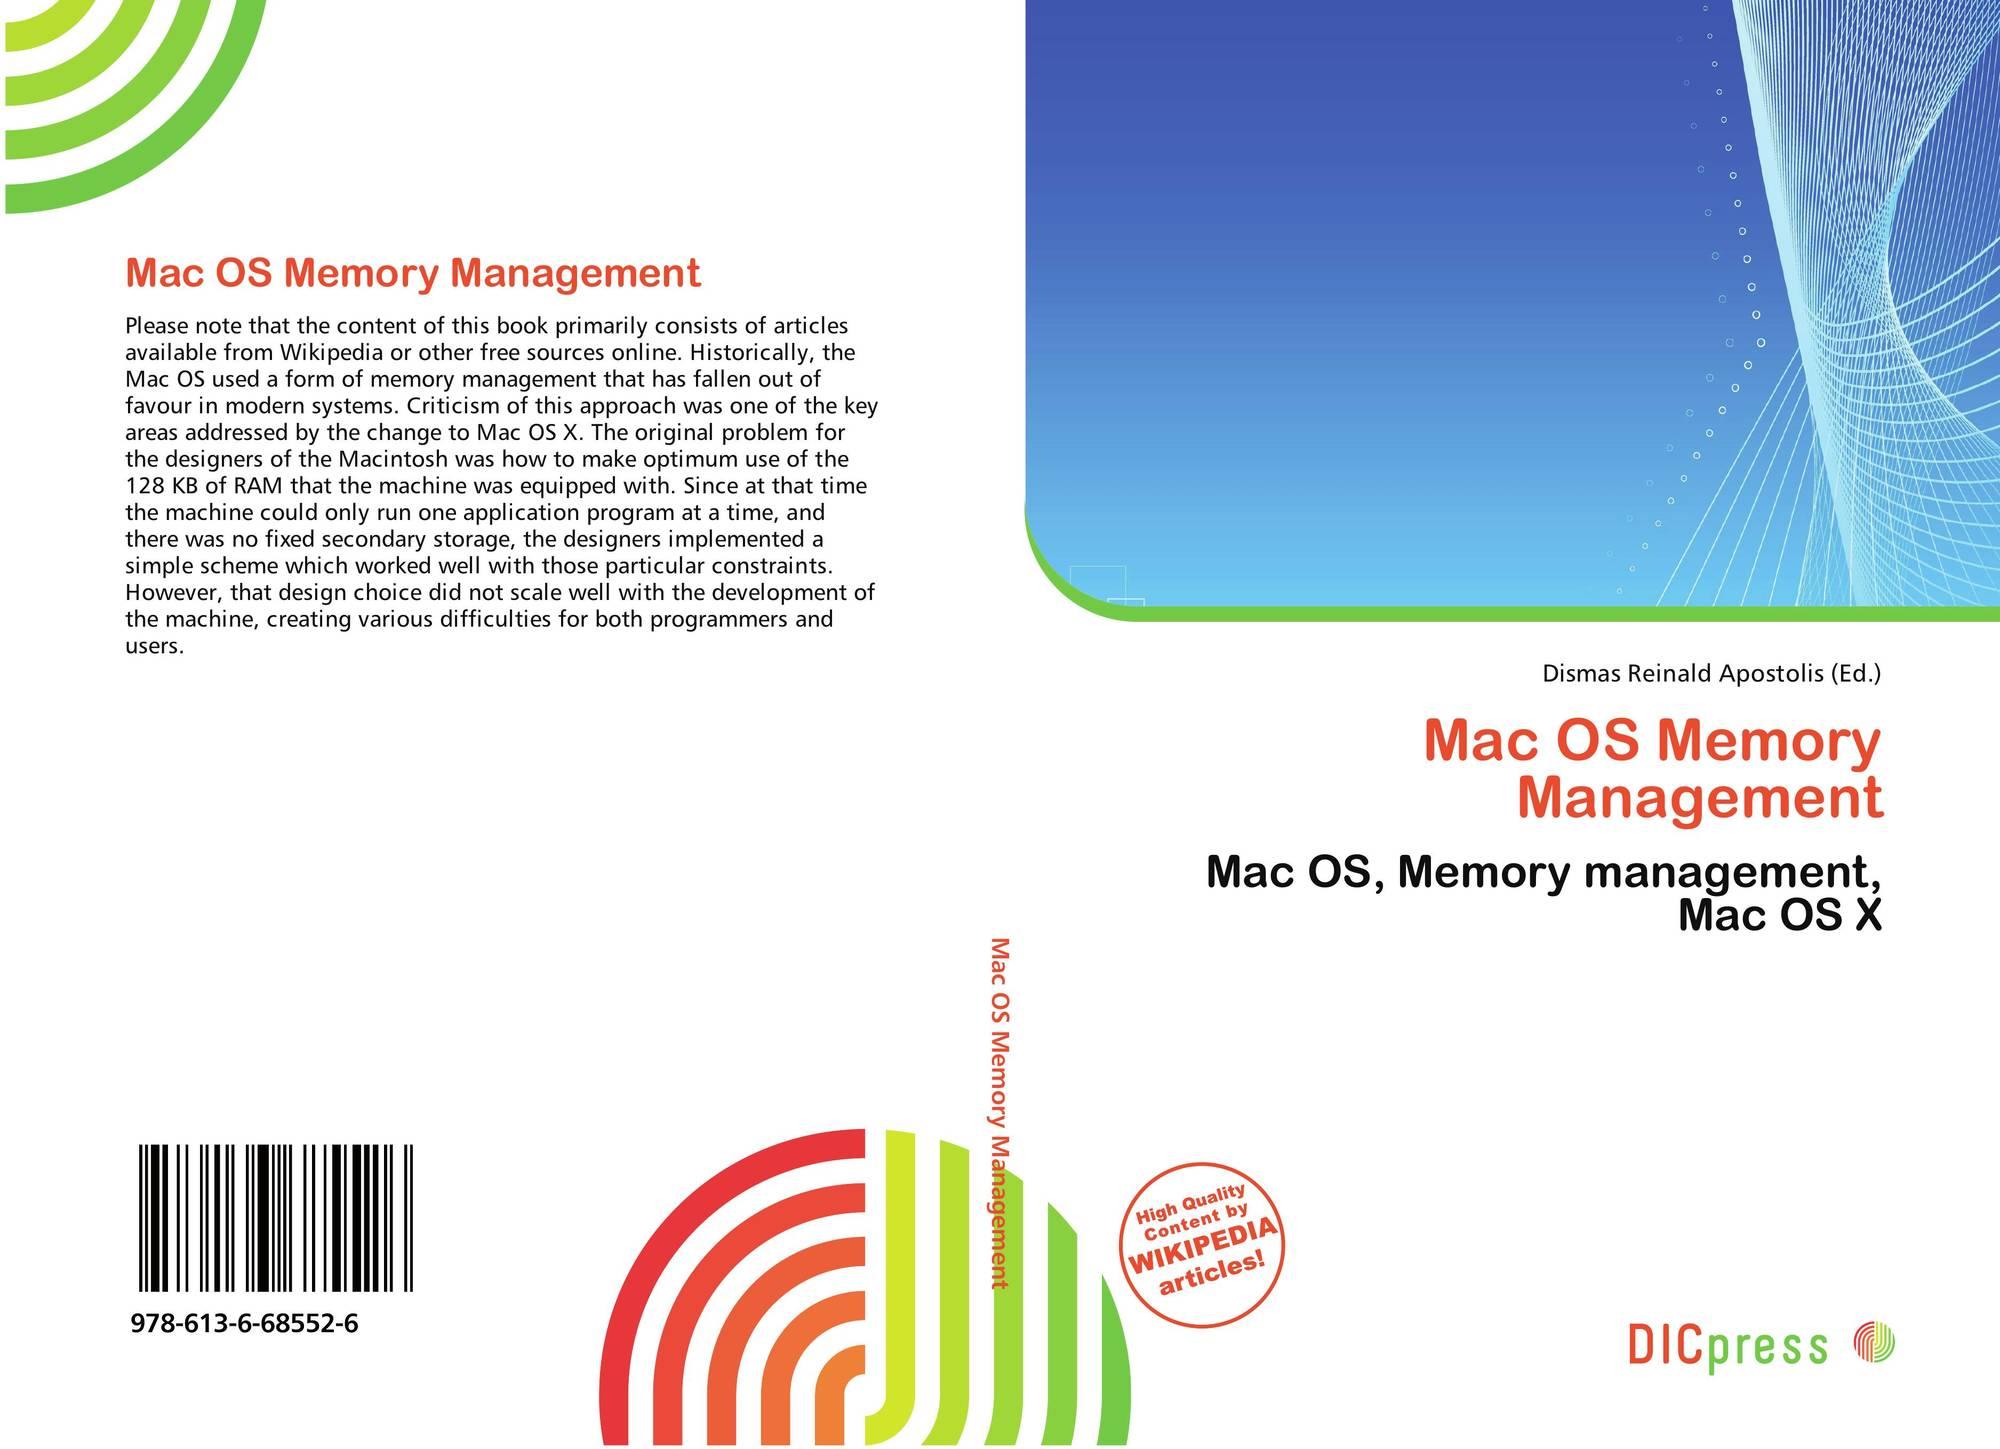 Mac OS Memory Management, 978-613-6-68552-6, 6136685523